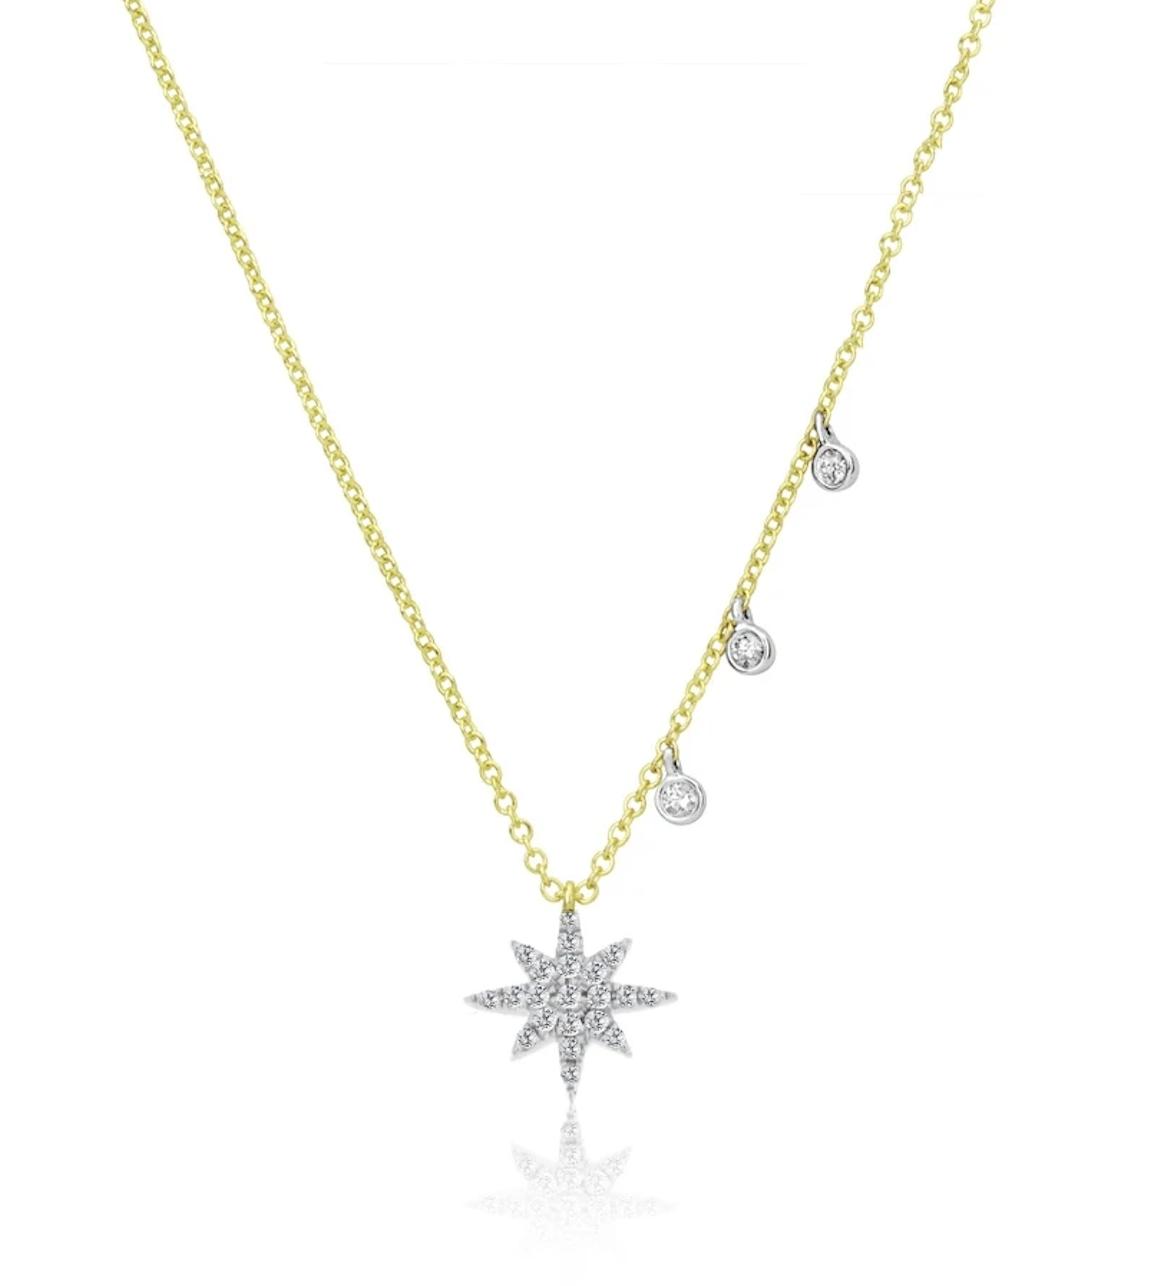 Meira T Dainty Diamond Starburst Necklace